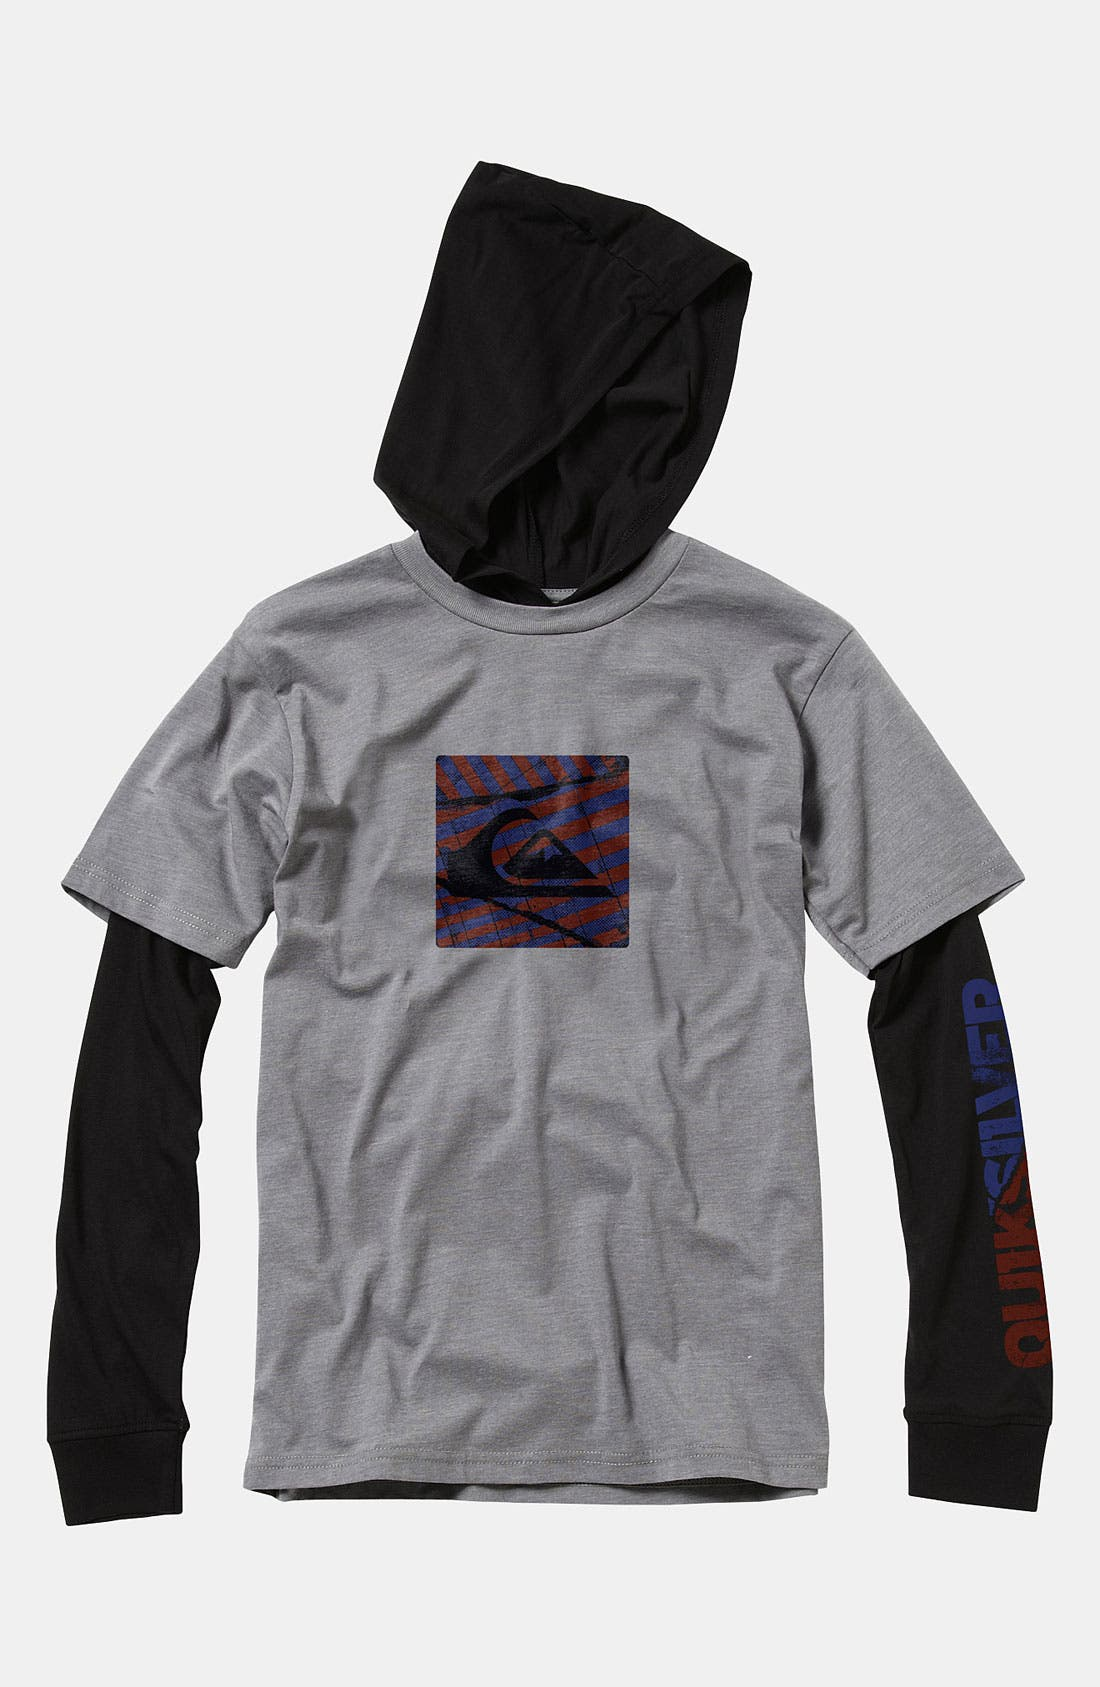 Alternate Image 1 Selected - Quiksilver 'Balin' Hooded Shirt (Big Boys)